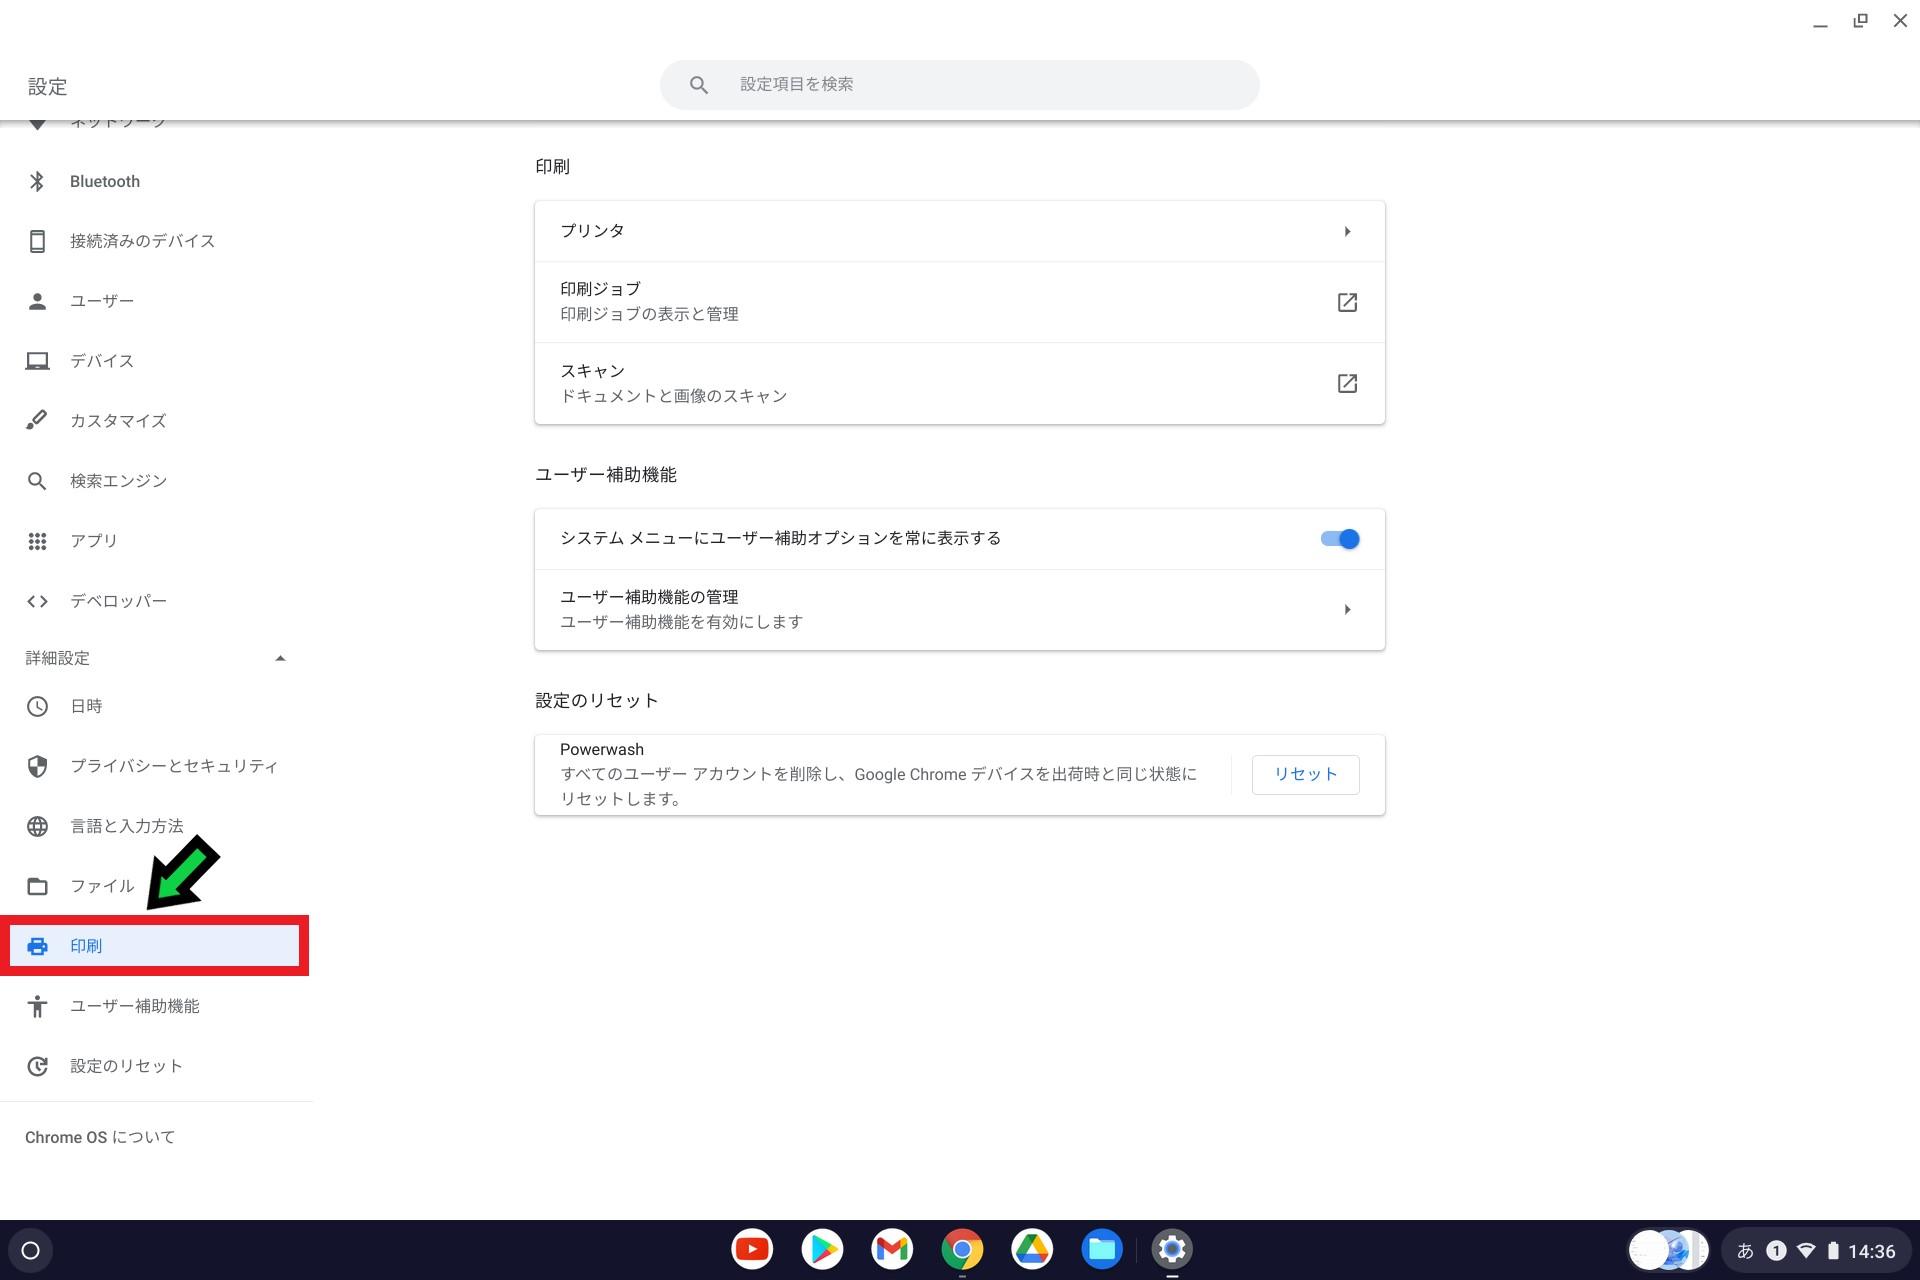 【Chrome book】クロームブックで使わなくなったプリンター設定を削除する方法